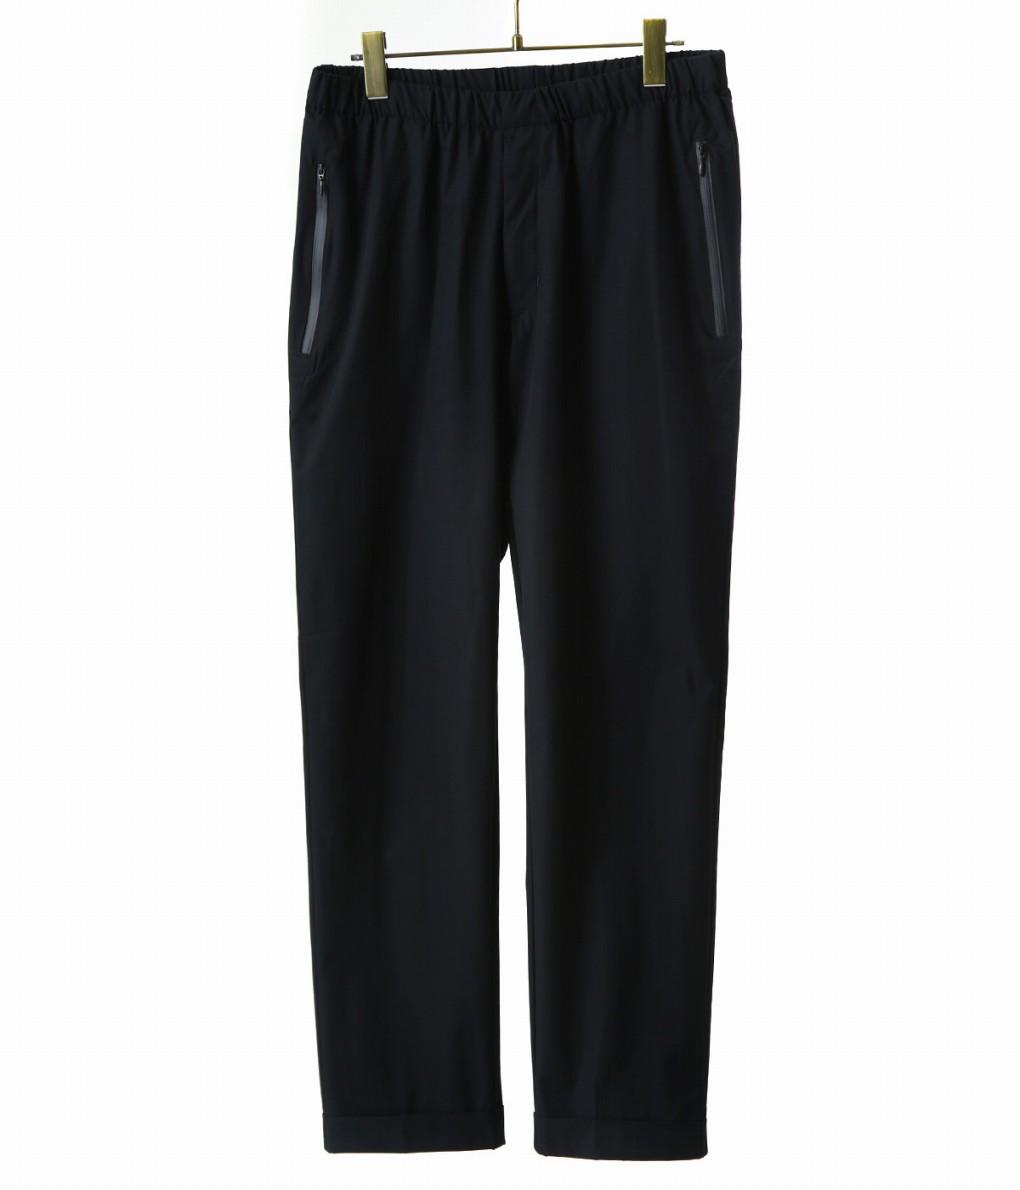 DESCENTE PAUSE / デサントポーズ : PACKABLE PANTS / 全2色 : パッカブル パンツ メンズ : DLMNJG80 【NOA】【WIS】